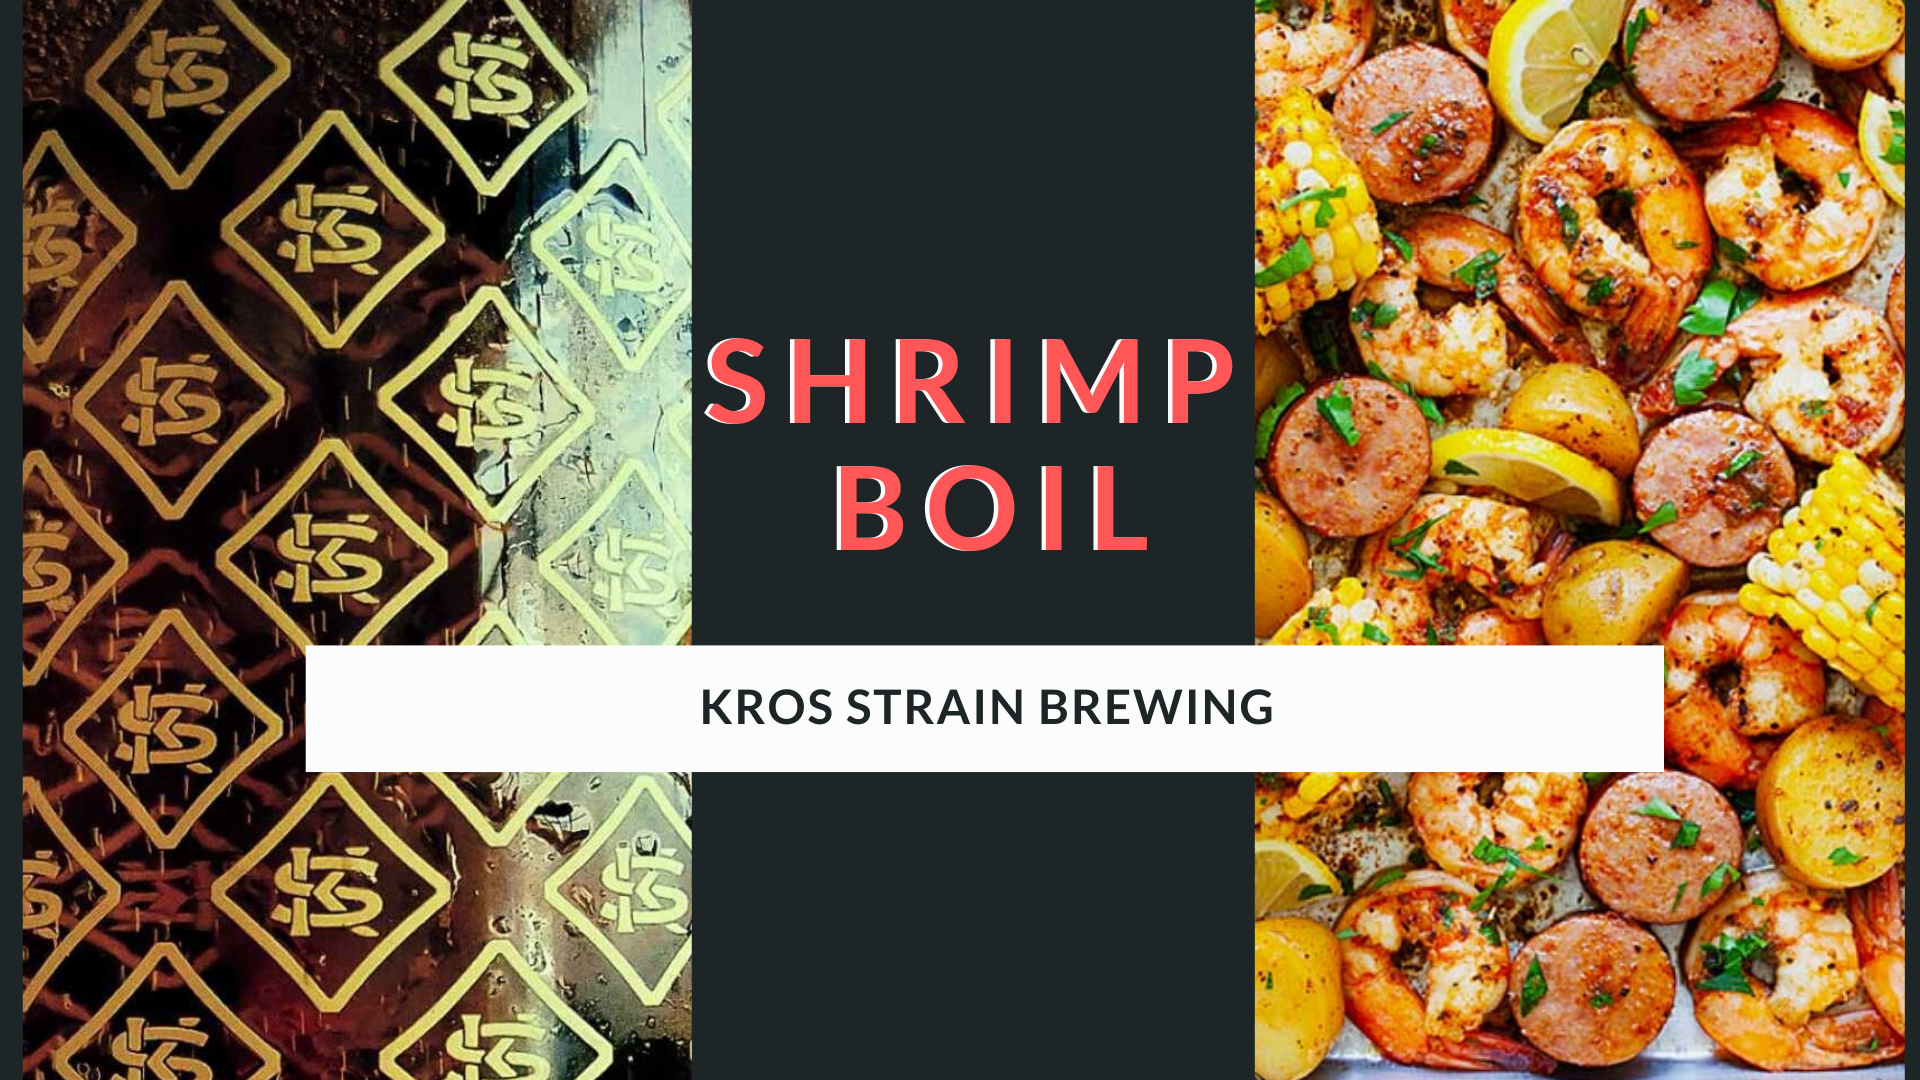 Shrimp Boil at Kros Strain Brewing